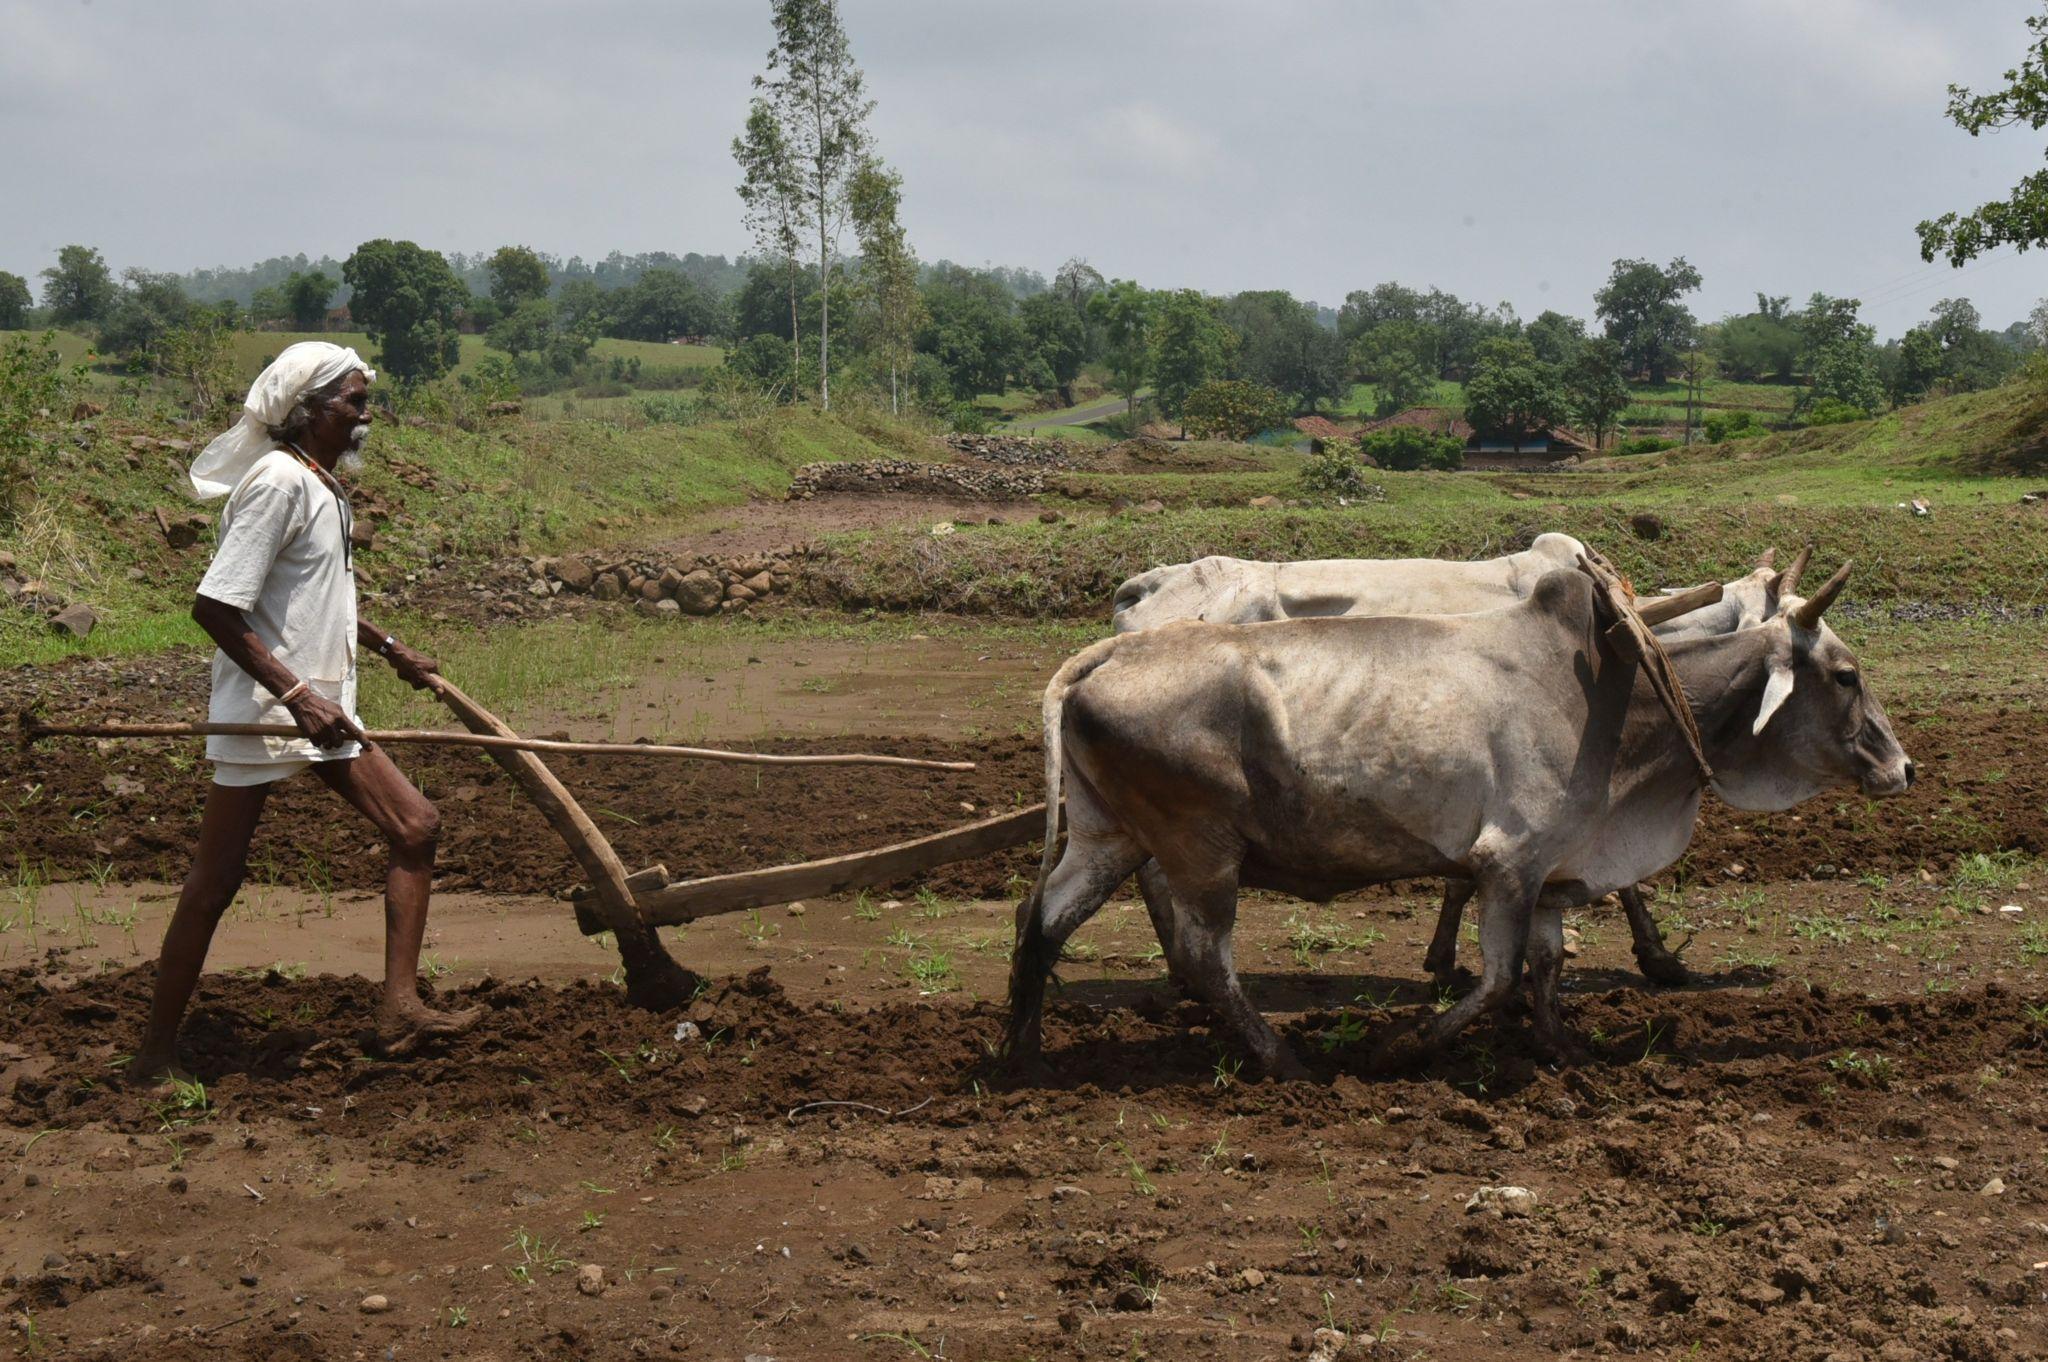 Farmer ploughing field near Jabalpur, India